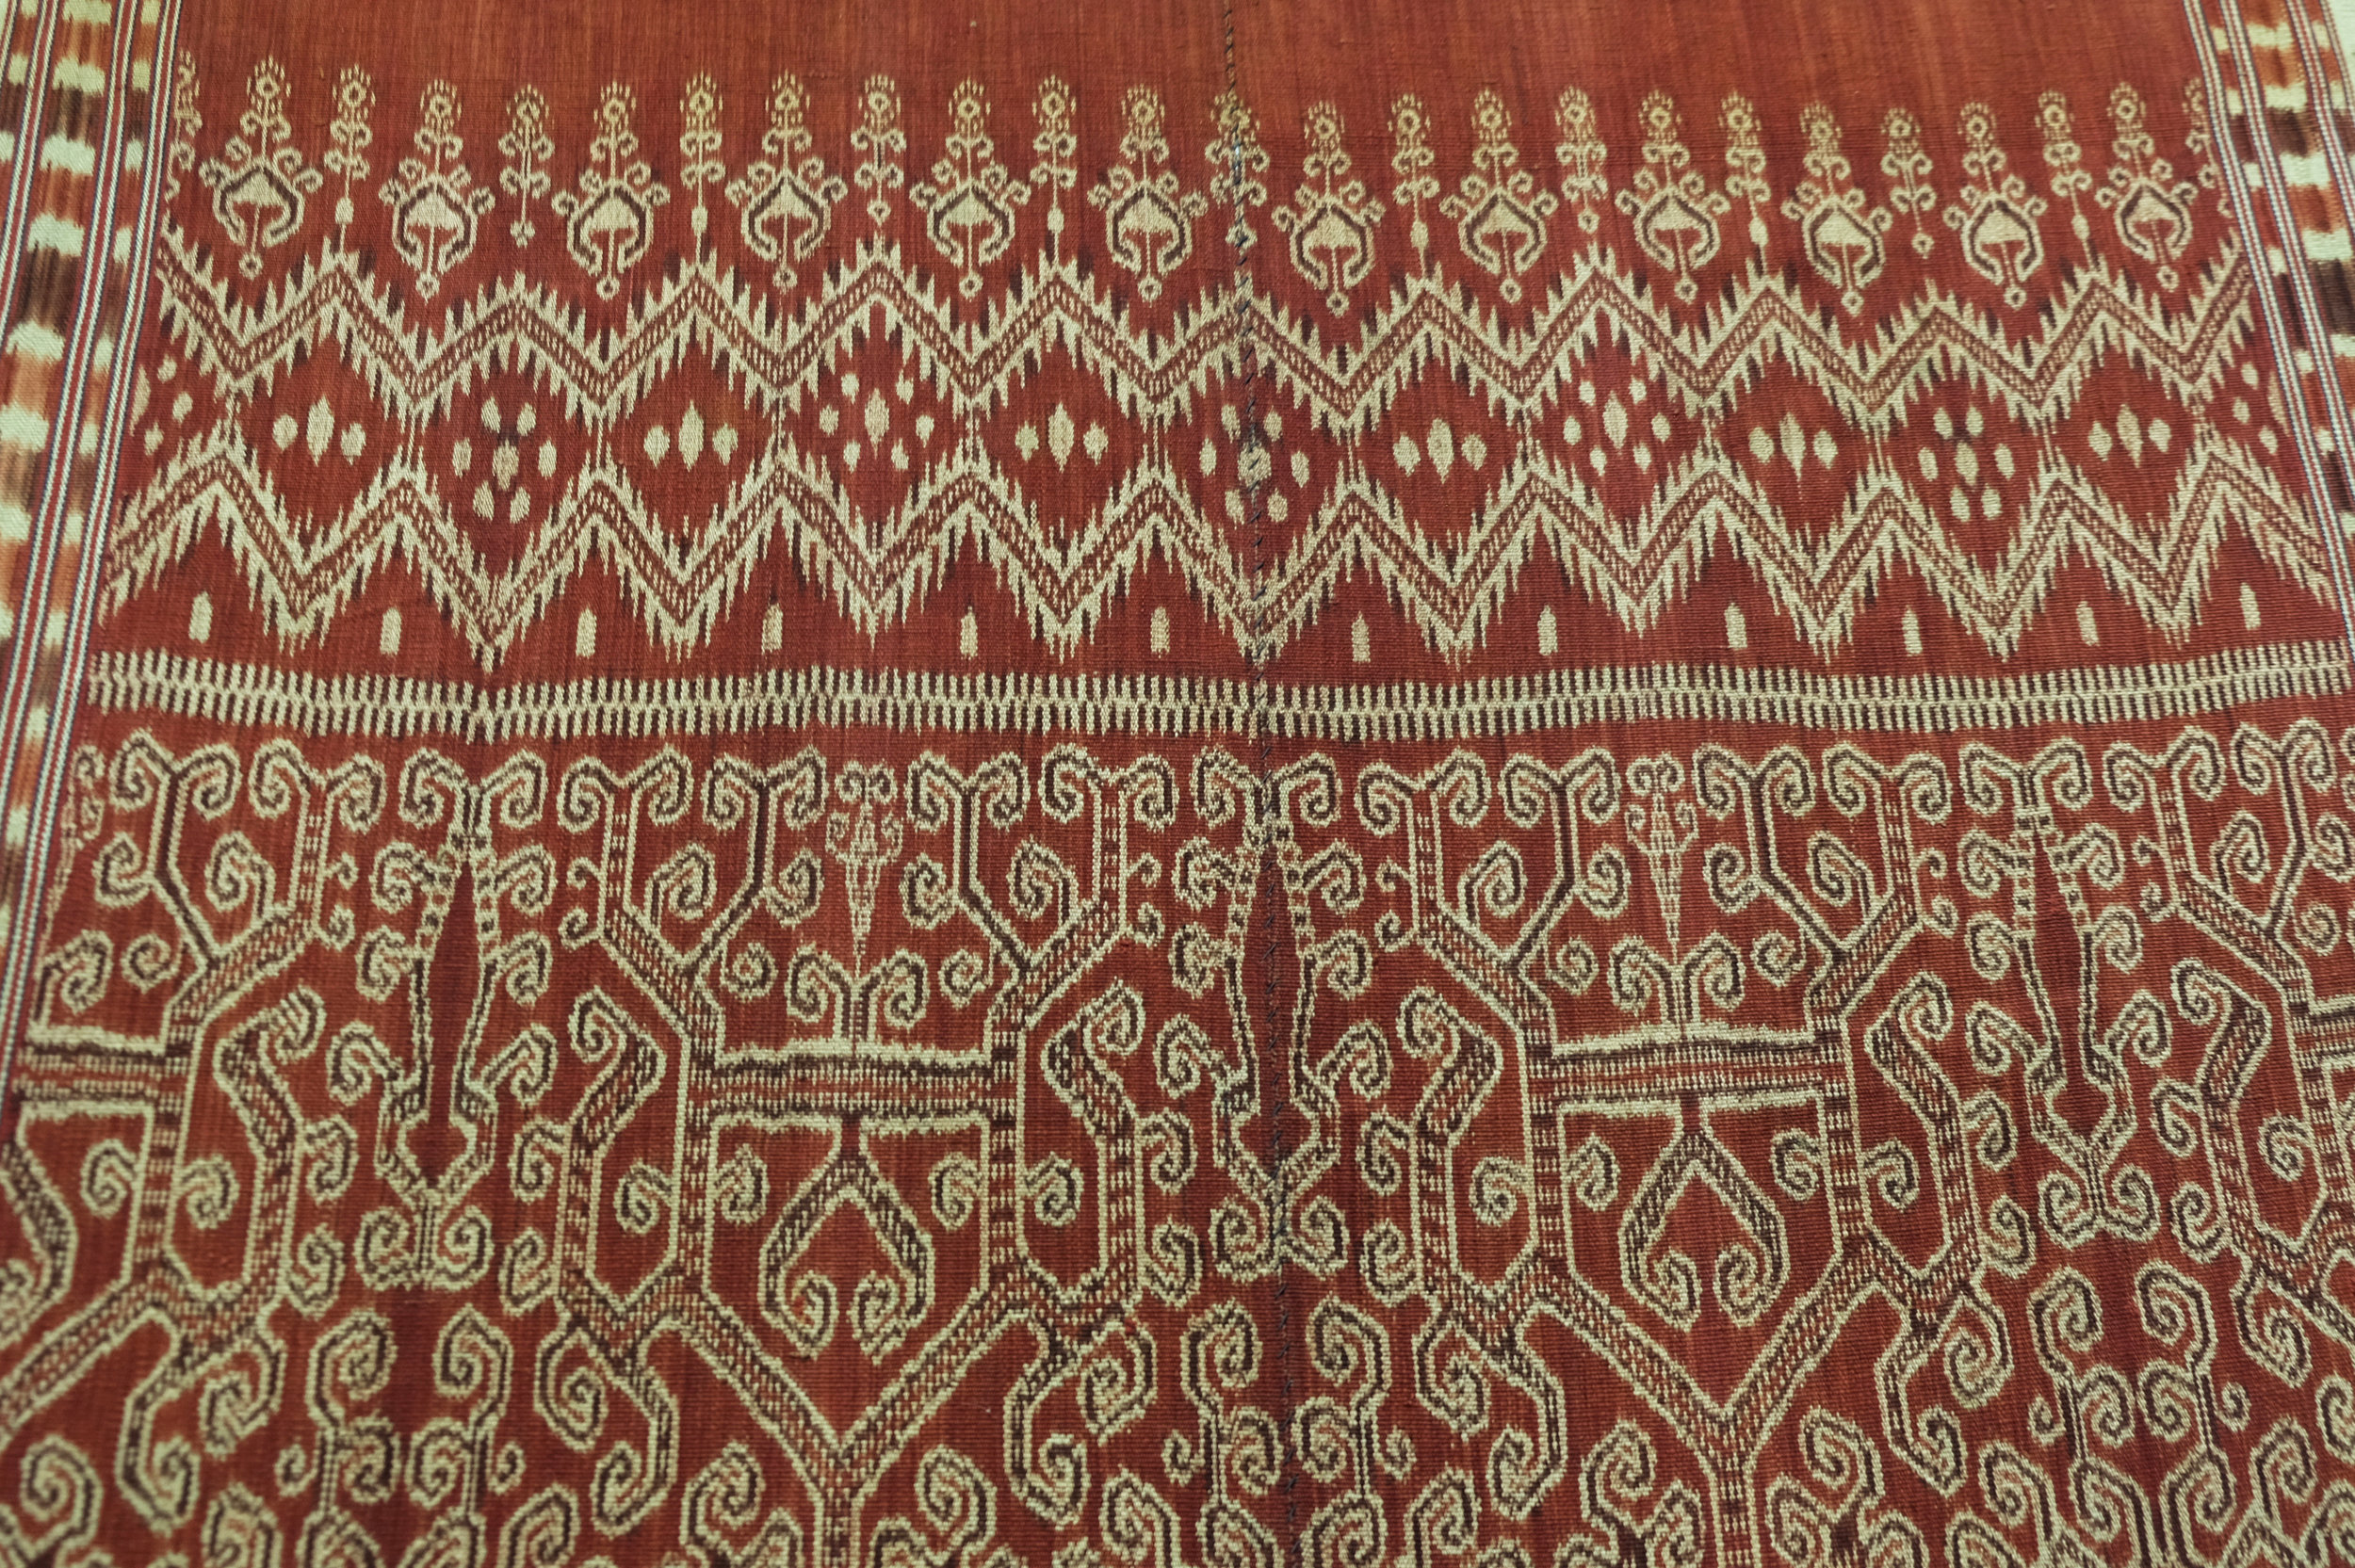 Borneo, Sarawak Saribas, Iban people  Pua , ritual blanket Warp ikat in hand-spun cotton 1940